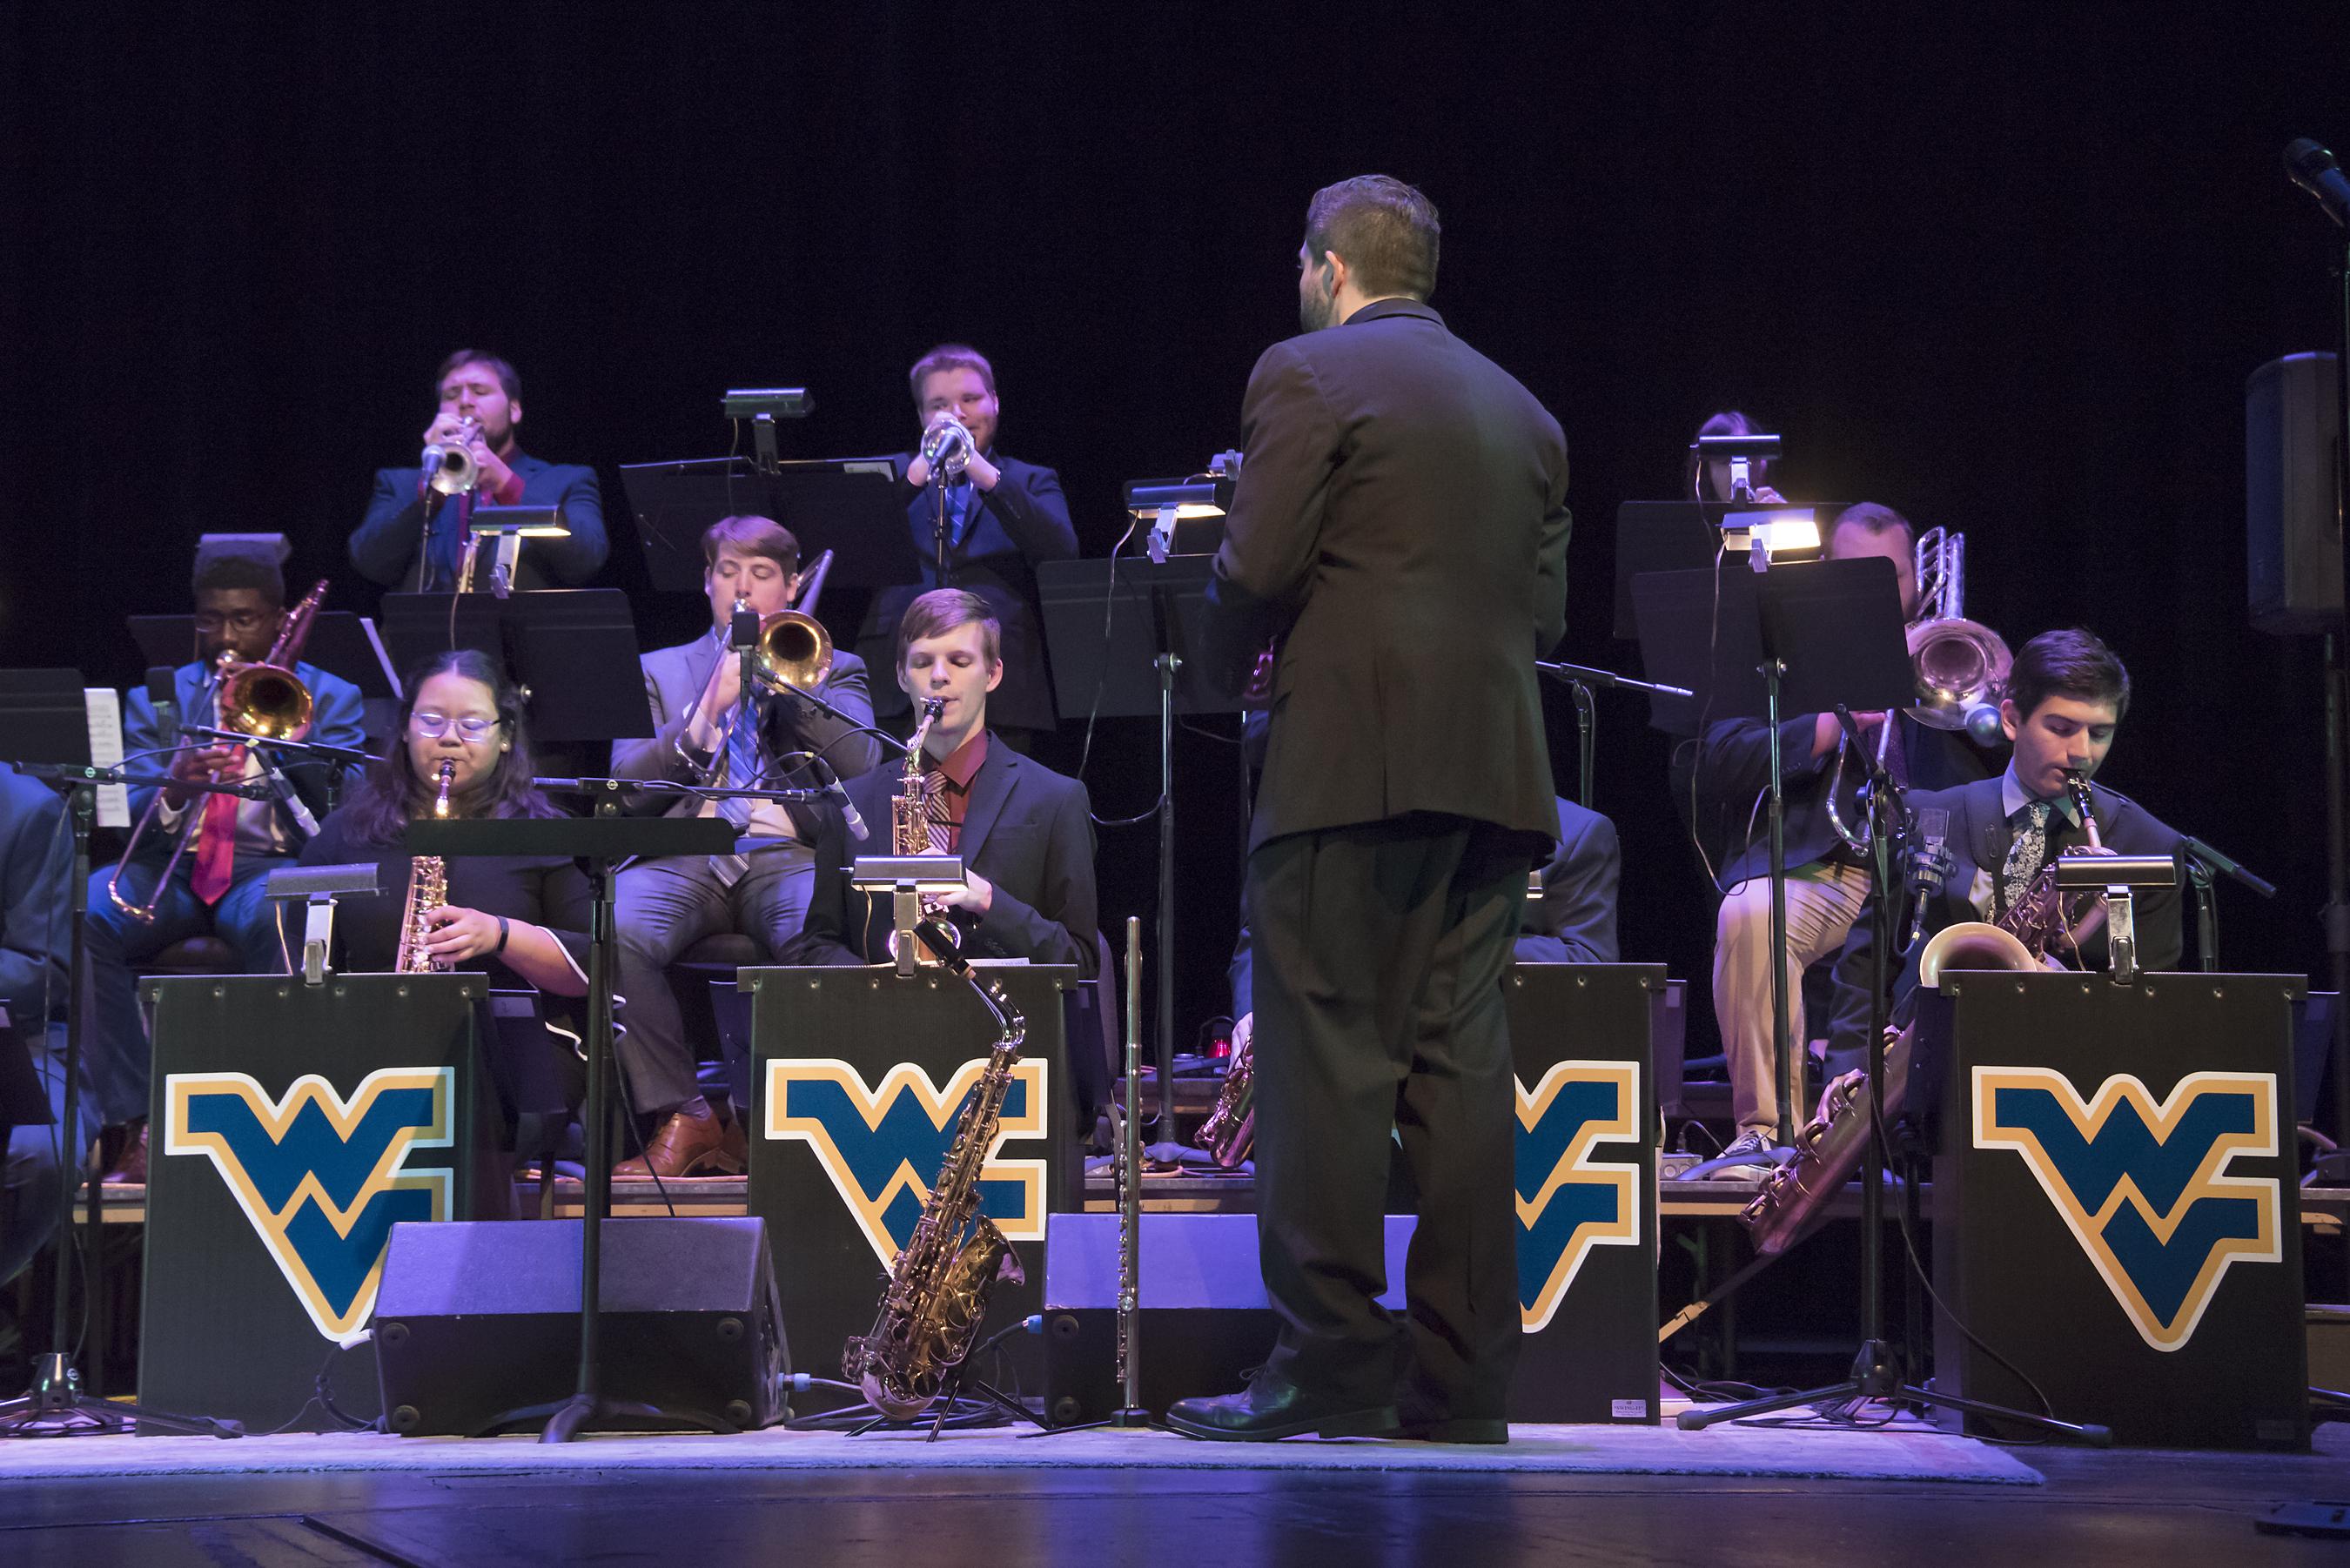 Wvu Big Band